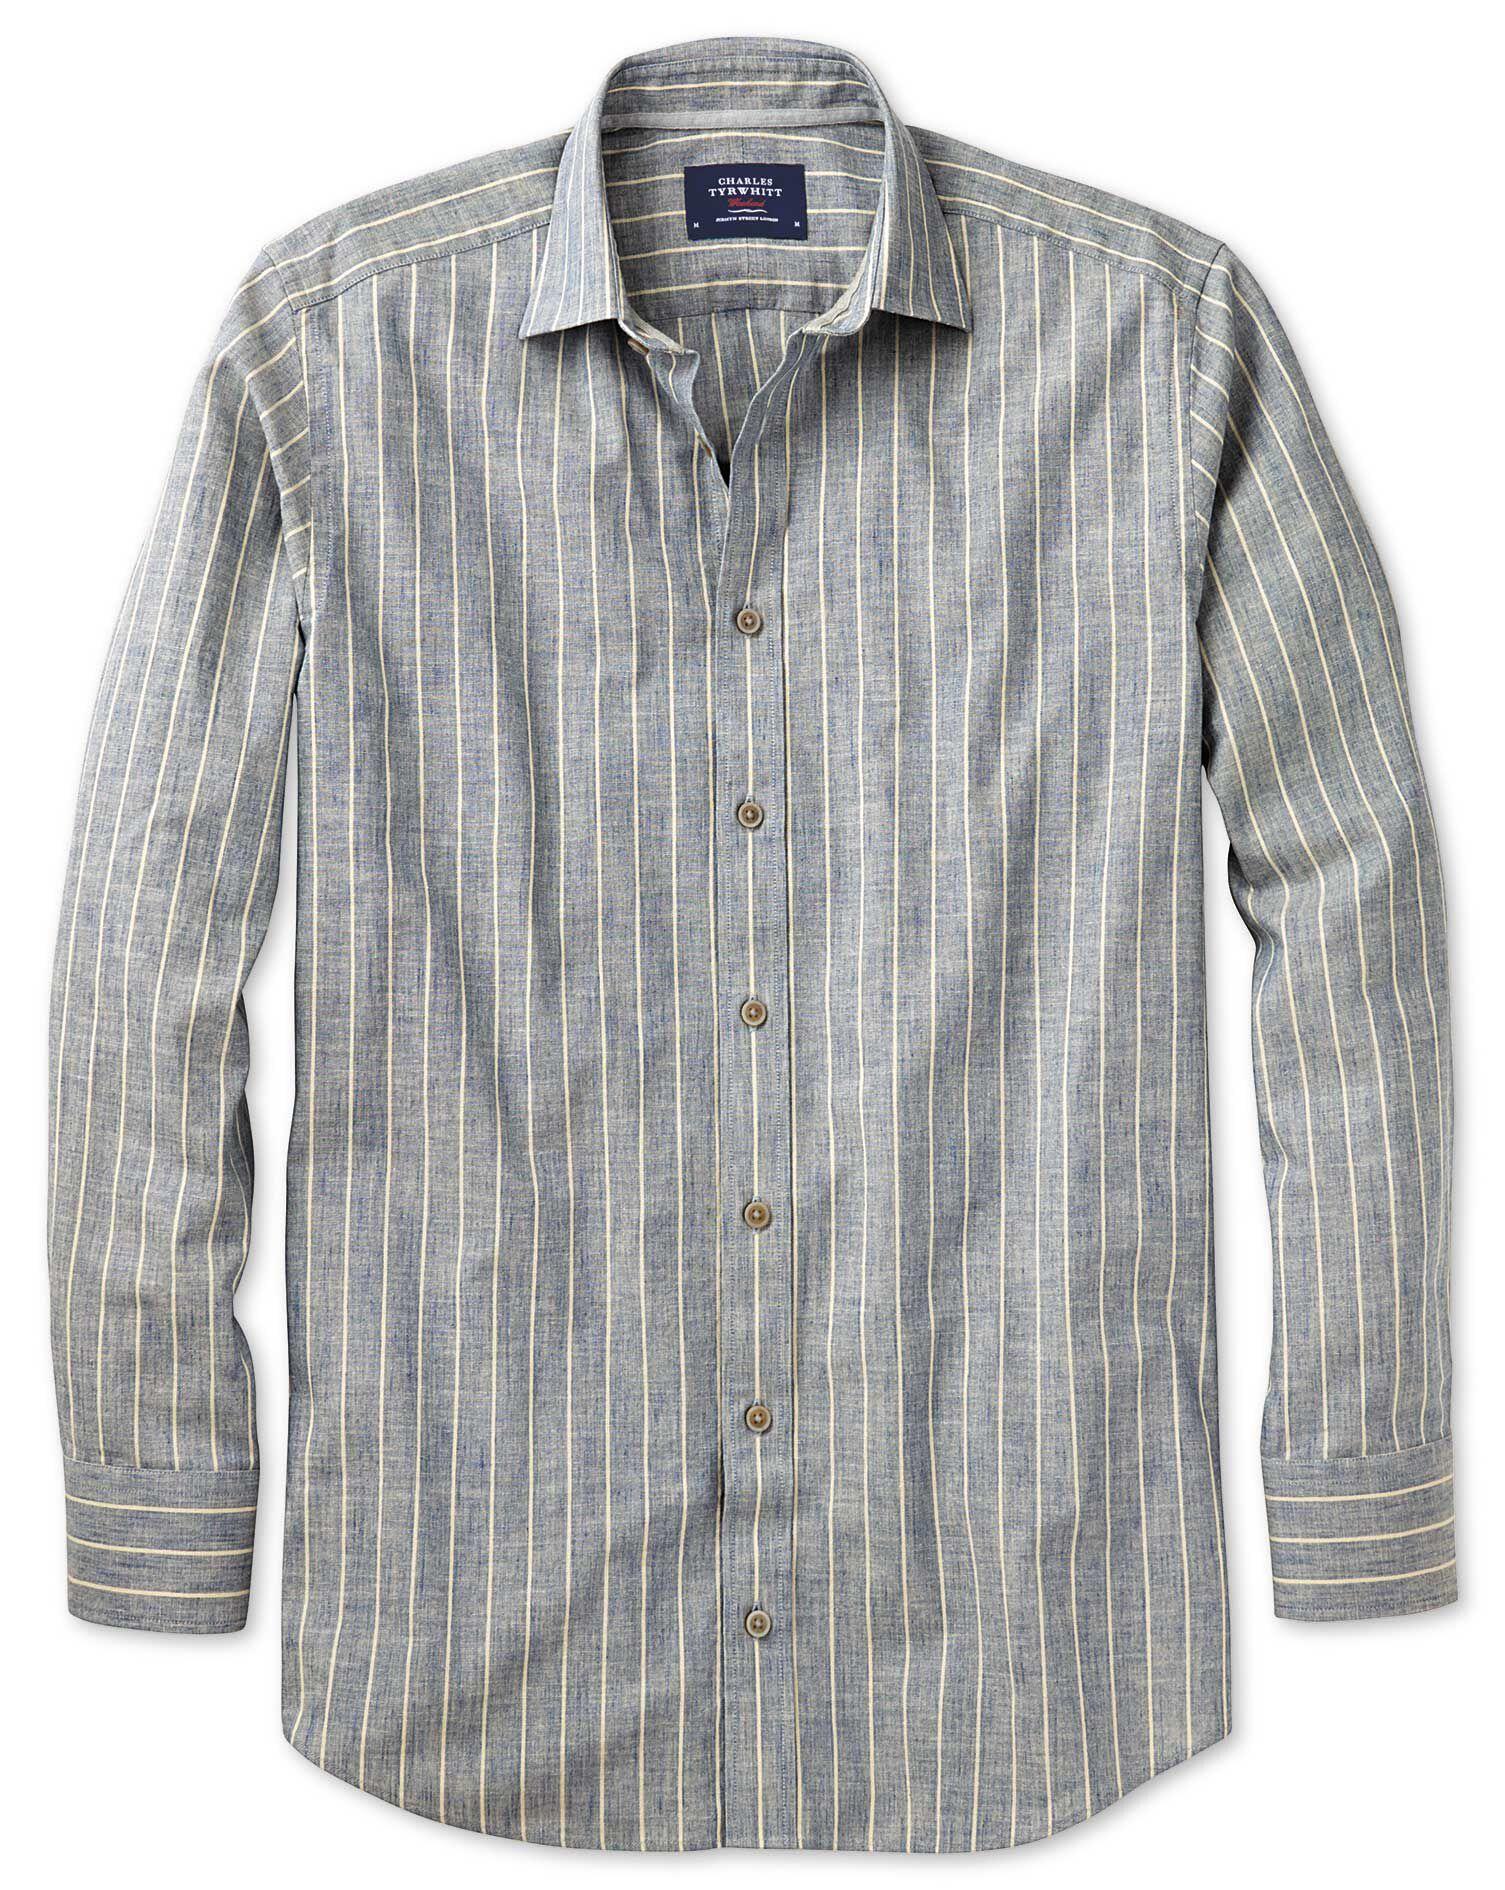 Extra Slim Fit Denim Blue Stripe Textured Cotton Shirt Single Cuff Size Large by Charles Tyrwhitt